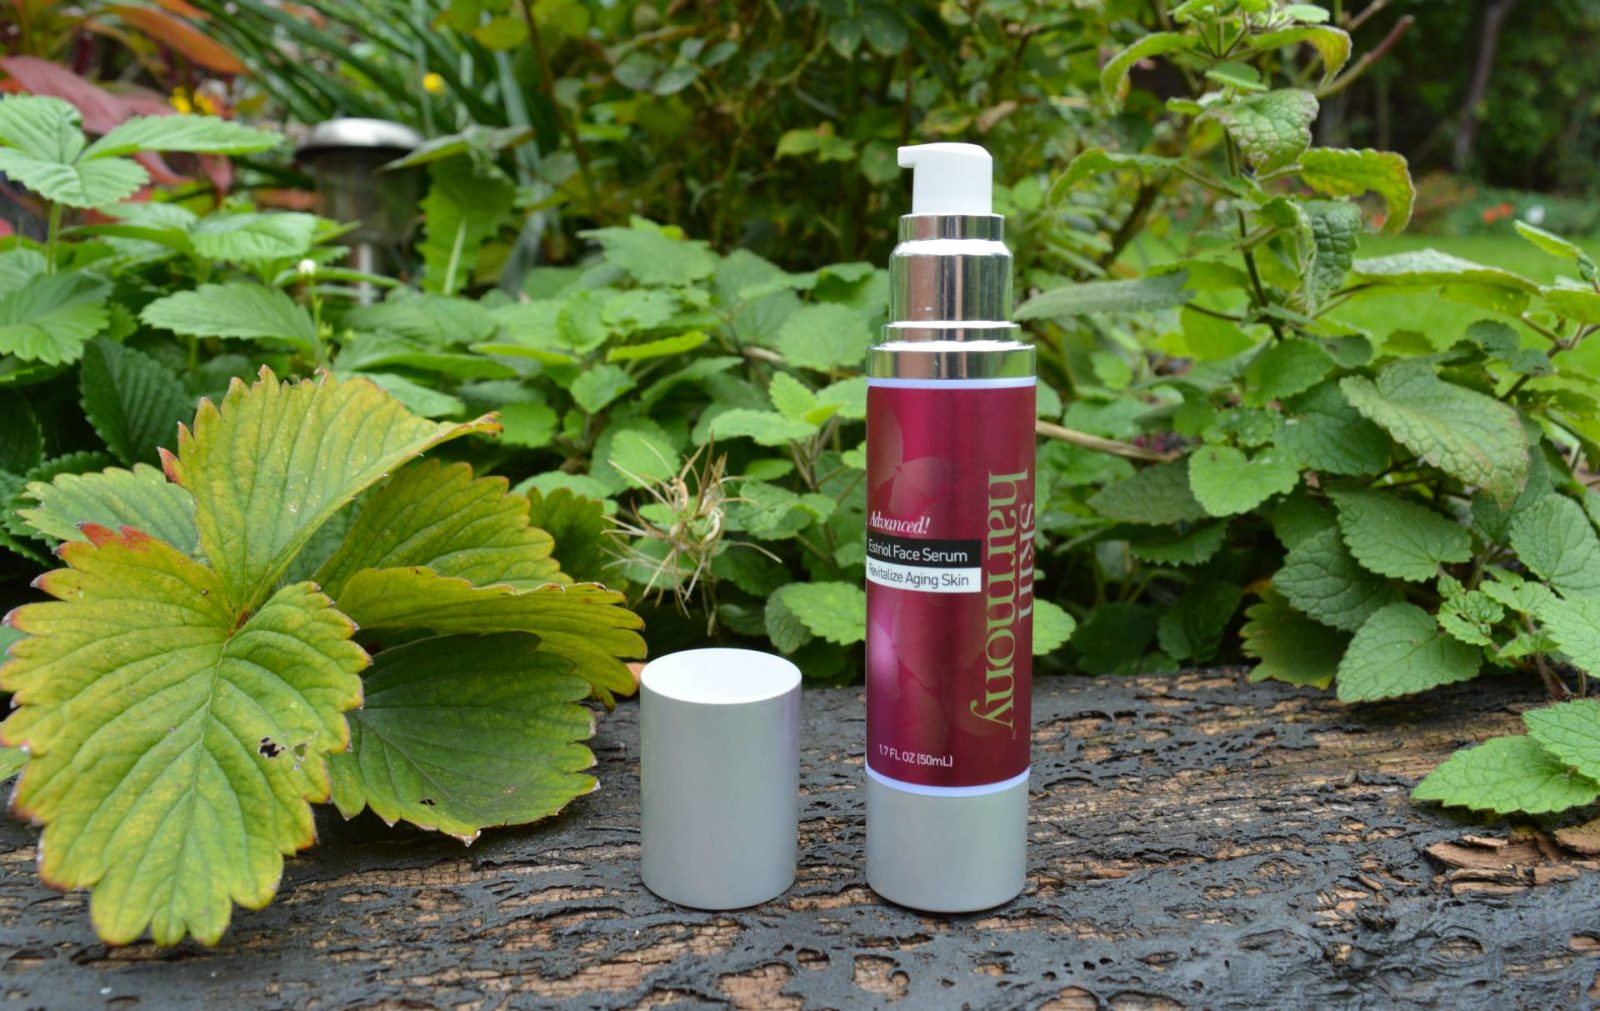 October Beauty Favourites, Skin Harmony Advanced Face Serum